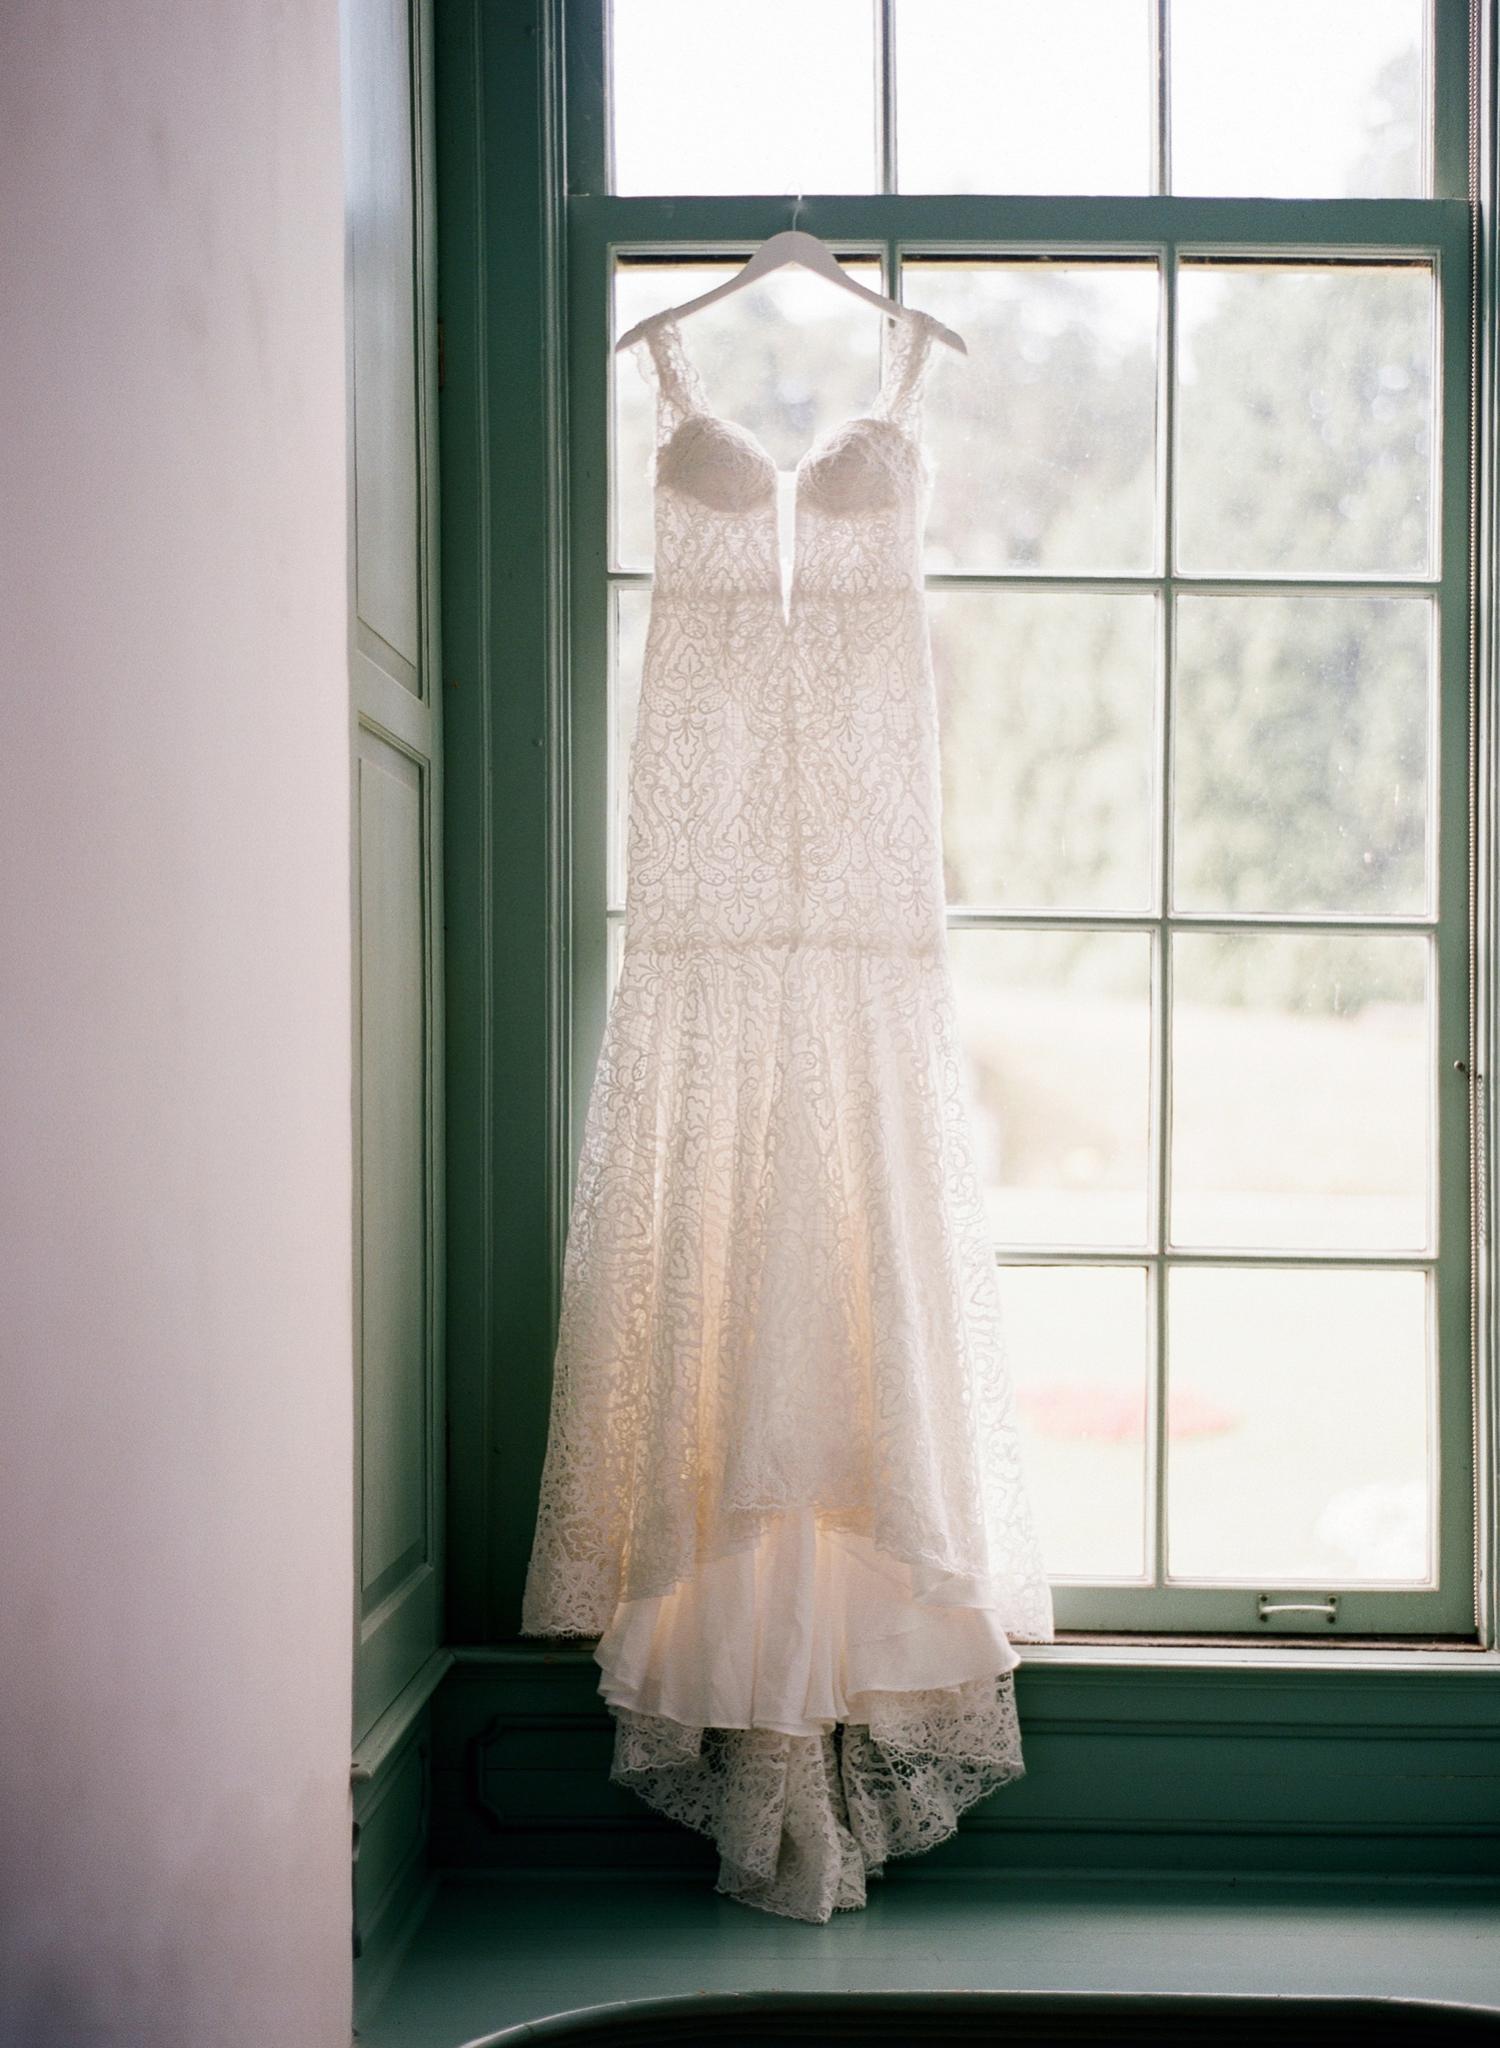 trouwjurk trouwen beste fotograaf nederland